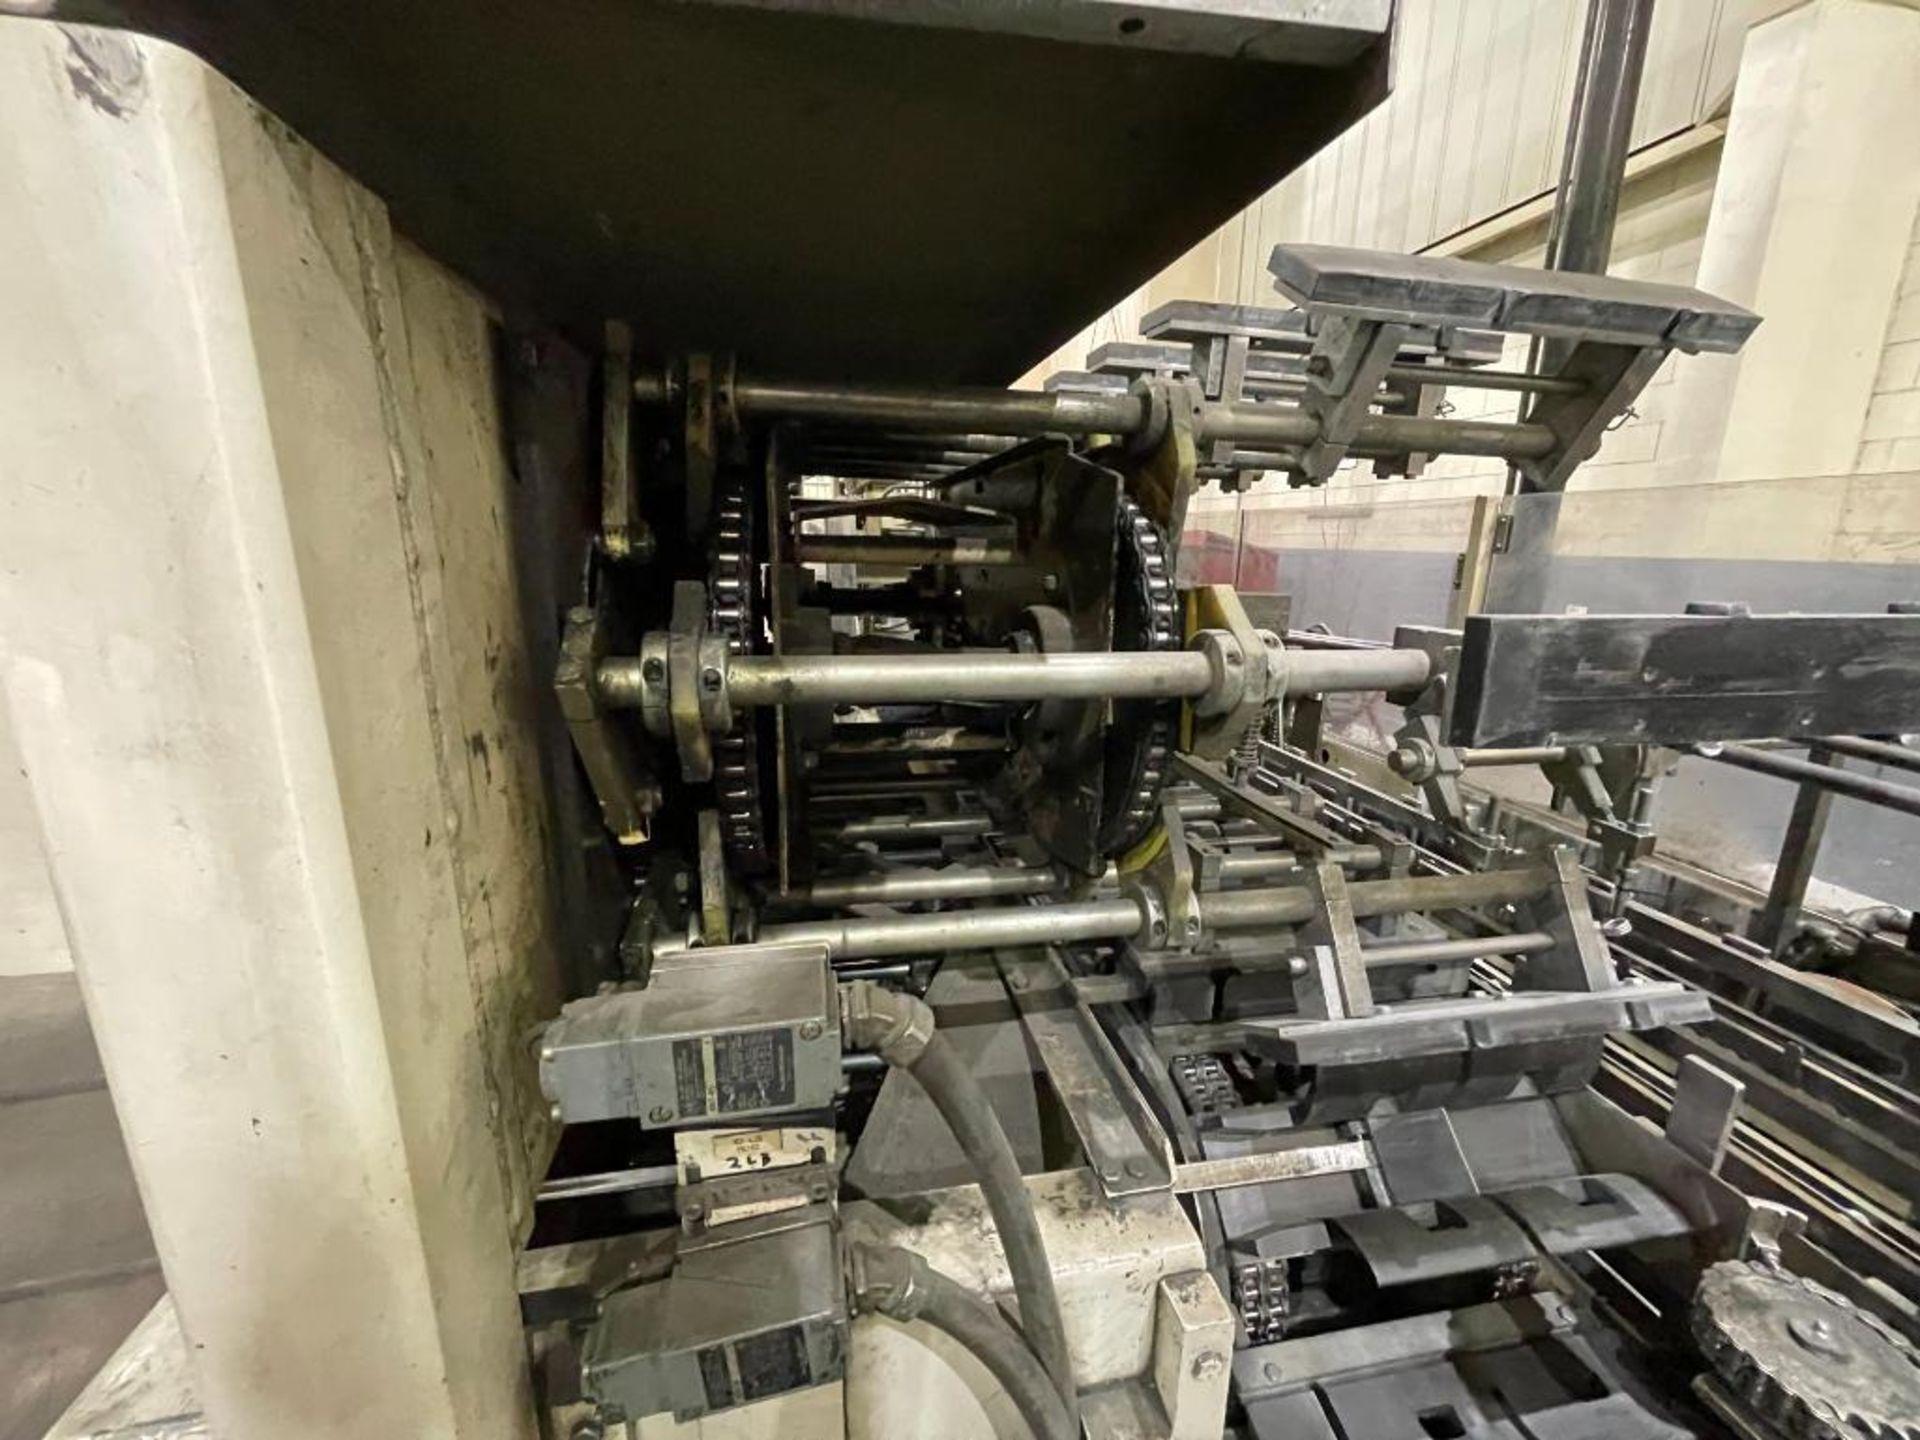 Hayes Machine Co. long goods cartoner, model 51BB - Image 49 of 64